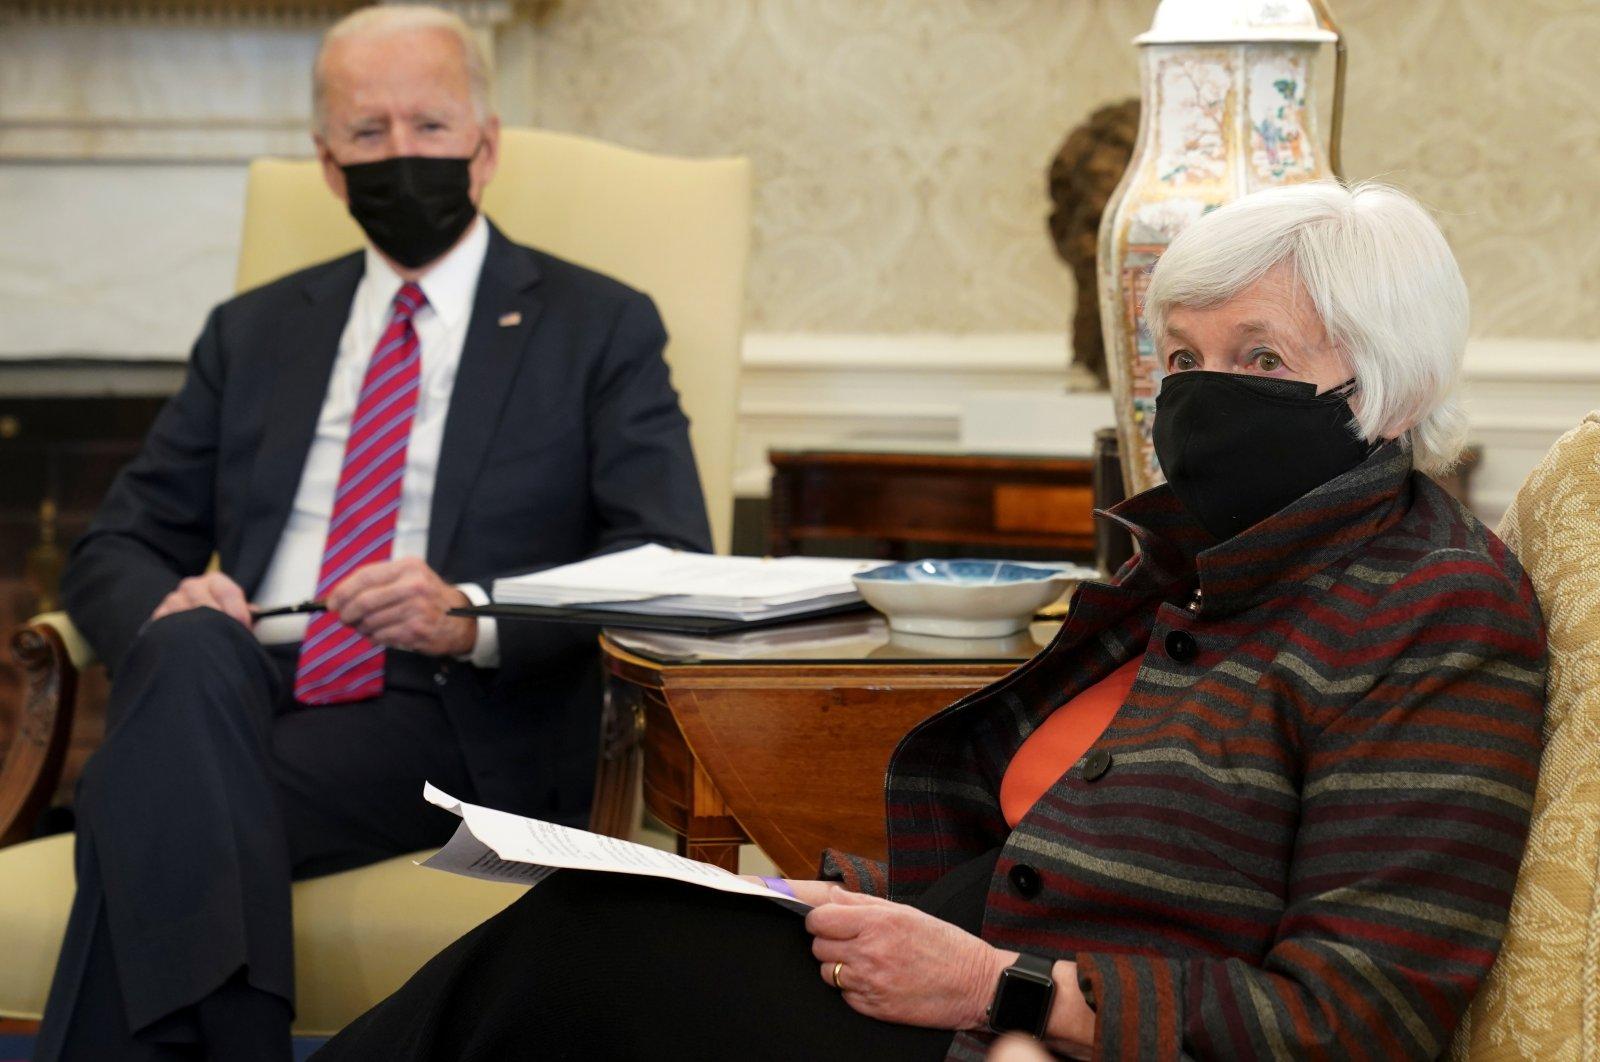 U.S. President Joe Biden meets with Treasury Secretary Janet Yellen in the Oval Office at the White House in Washington, U.S., Jan. 29, 2021. (Reuters Photo)